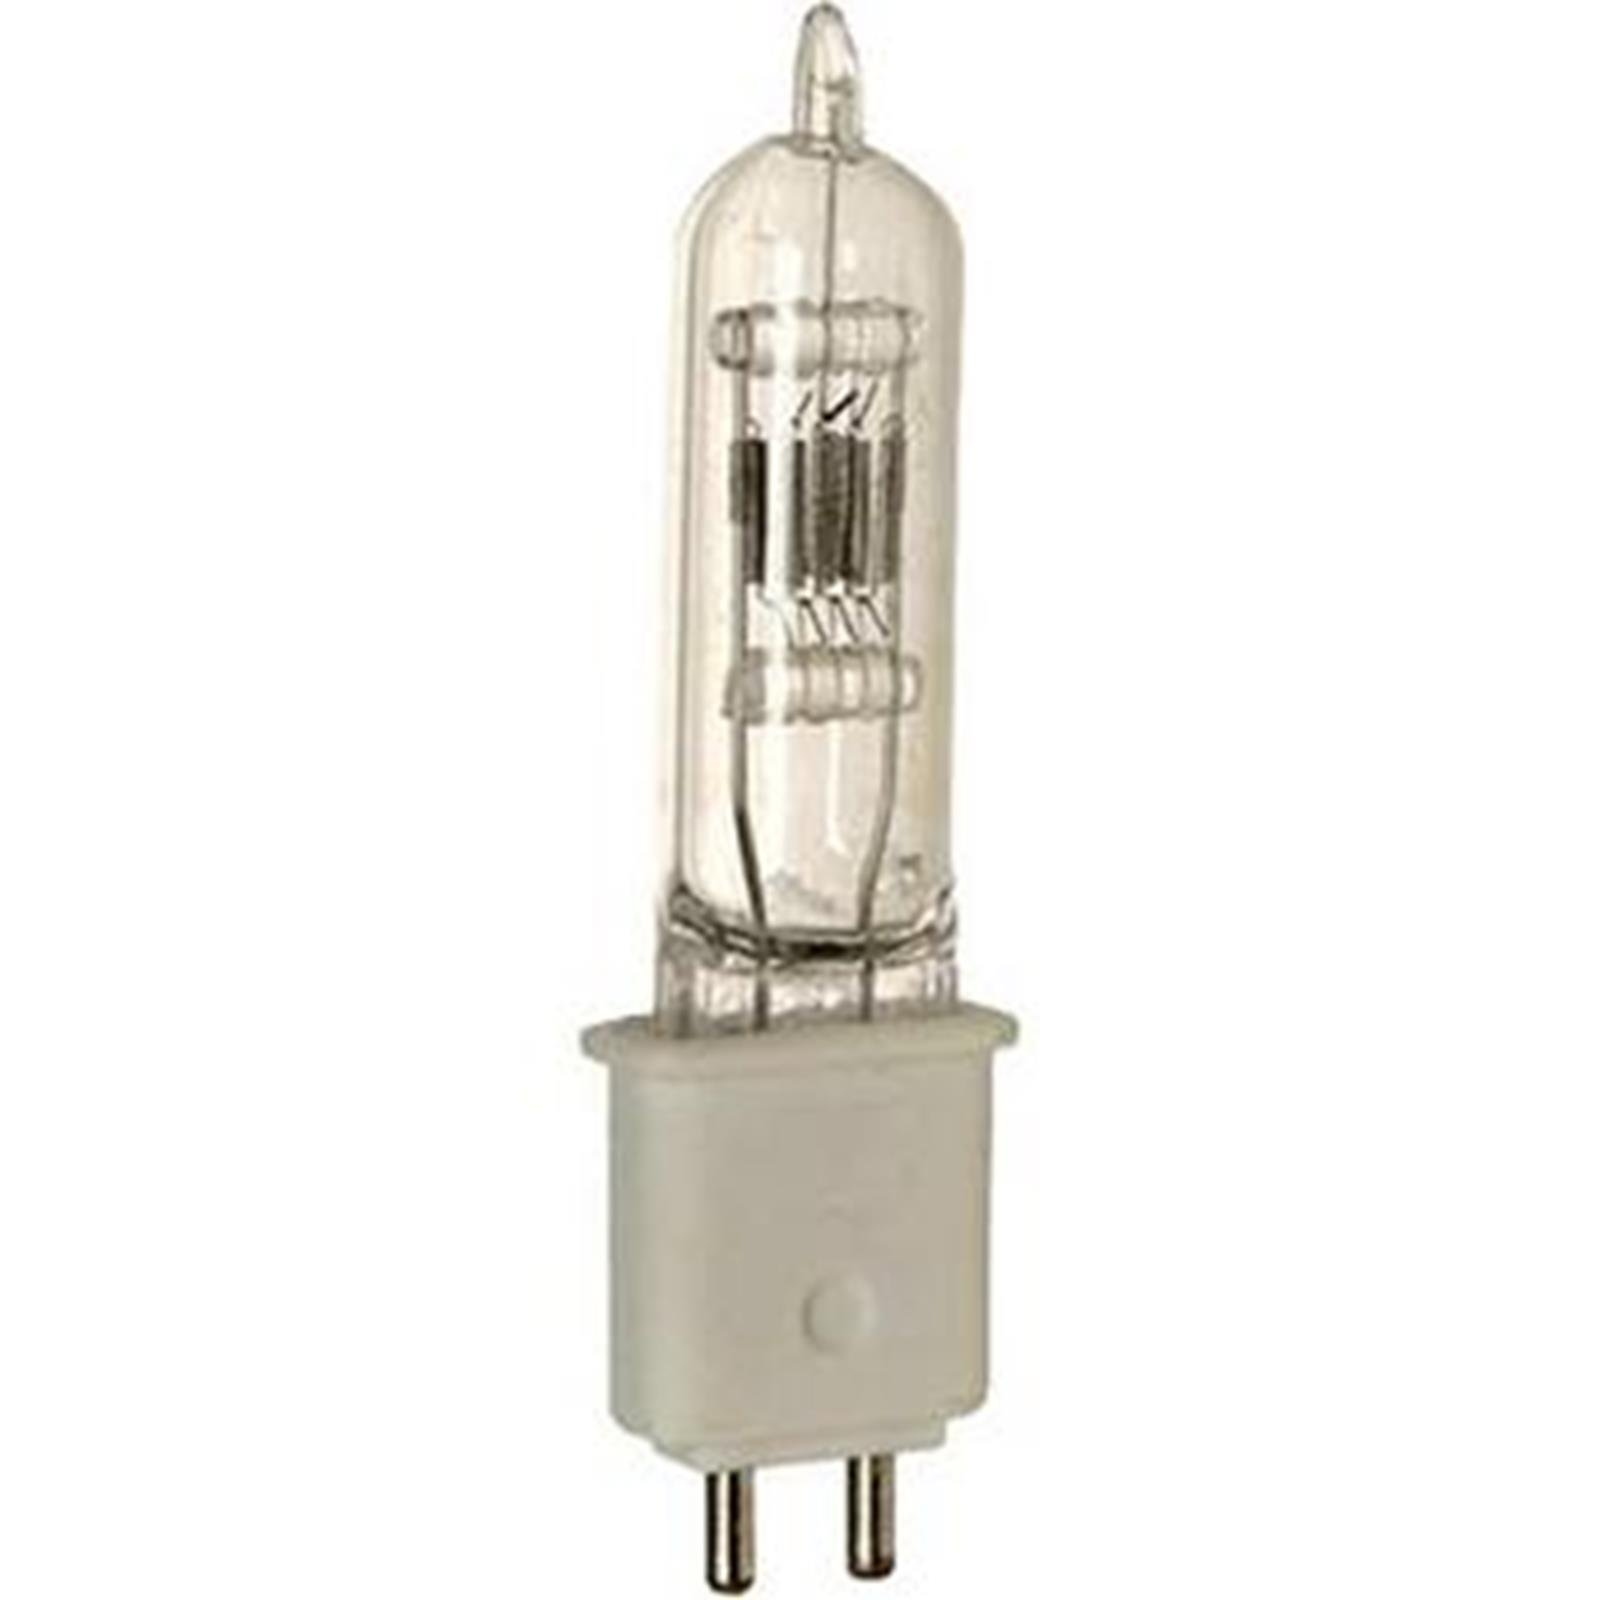 4 Qty. GLC Osram 575w 115v G9.5 Lamp Bulb HP600 54507